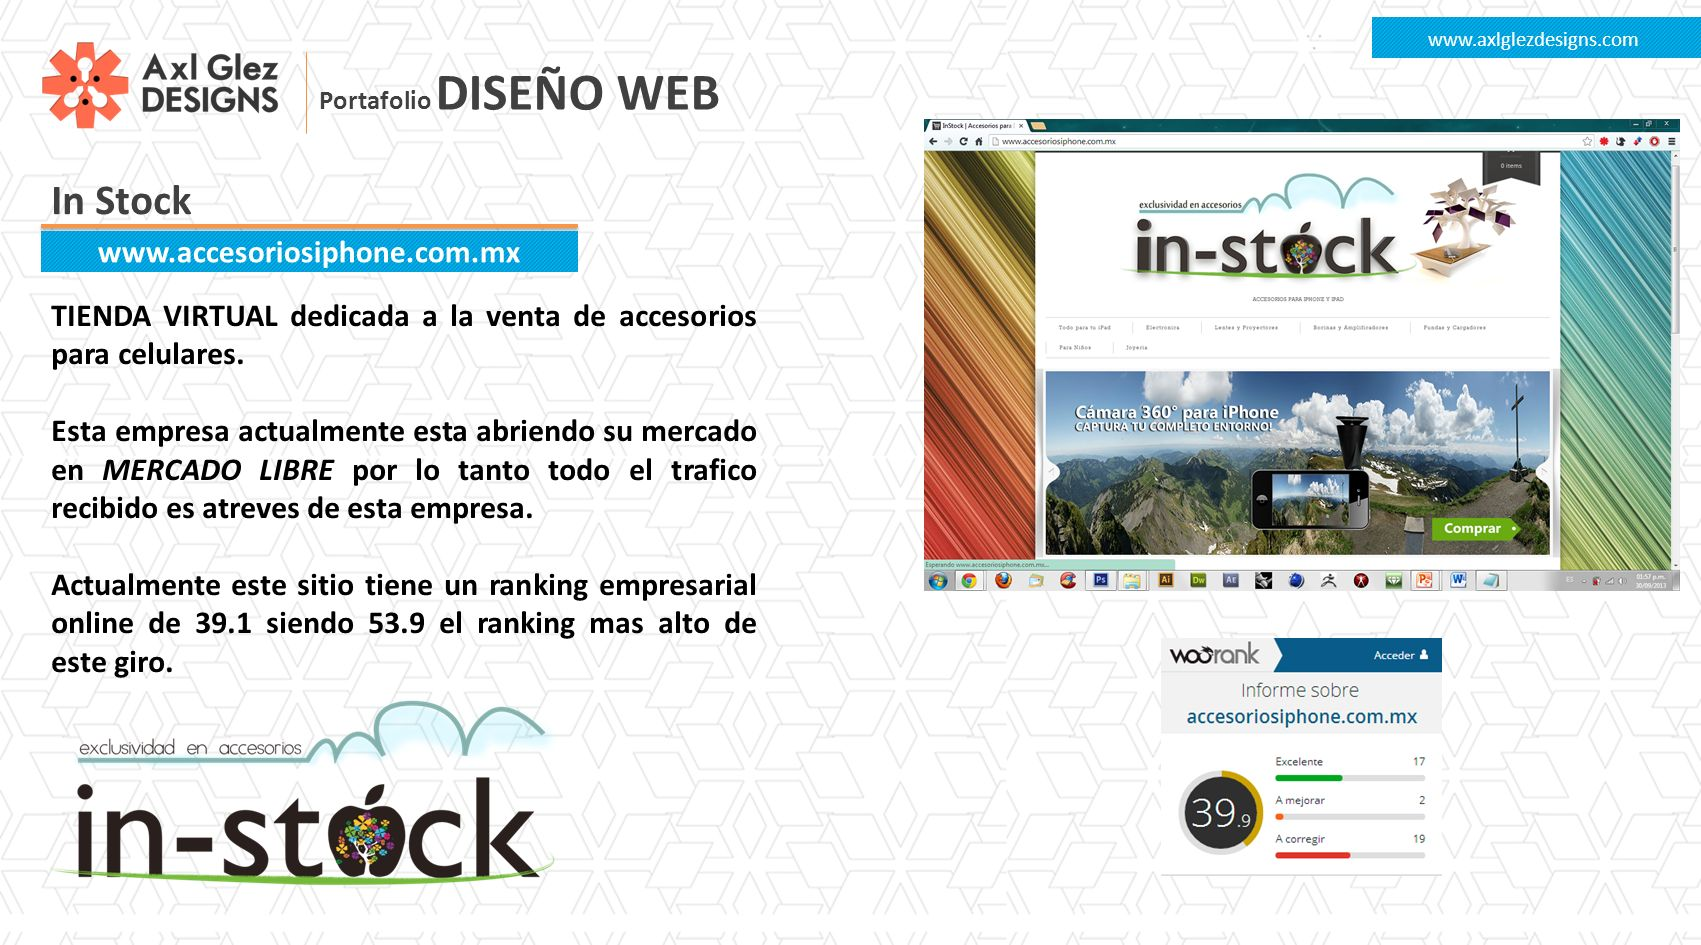 In Stock www.accesoriosiphone.com.mx